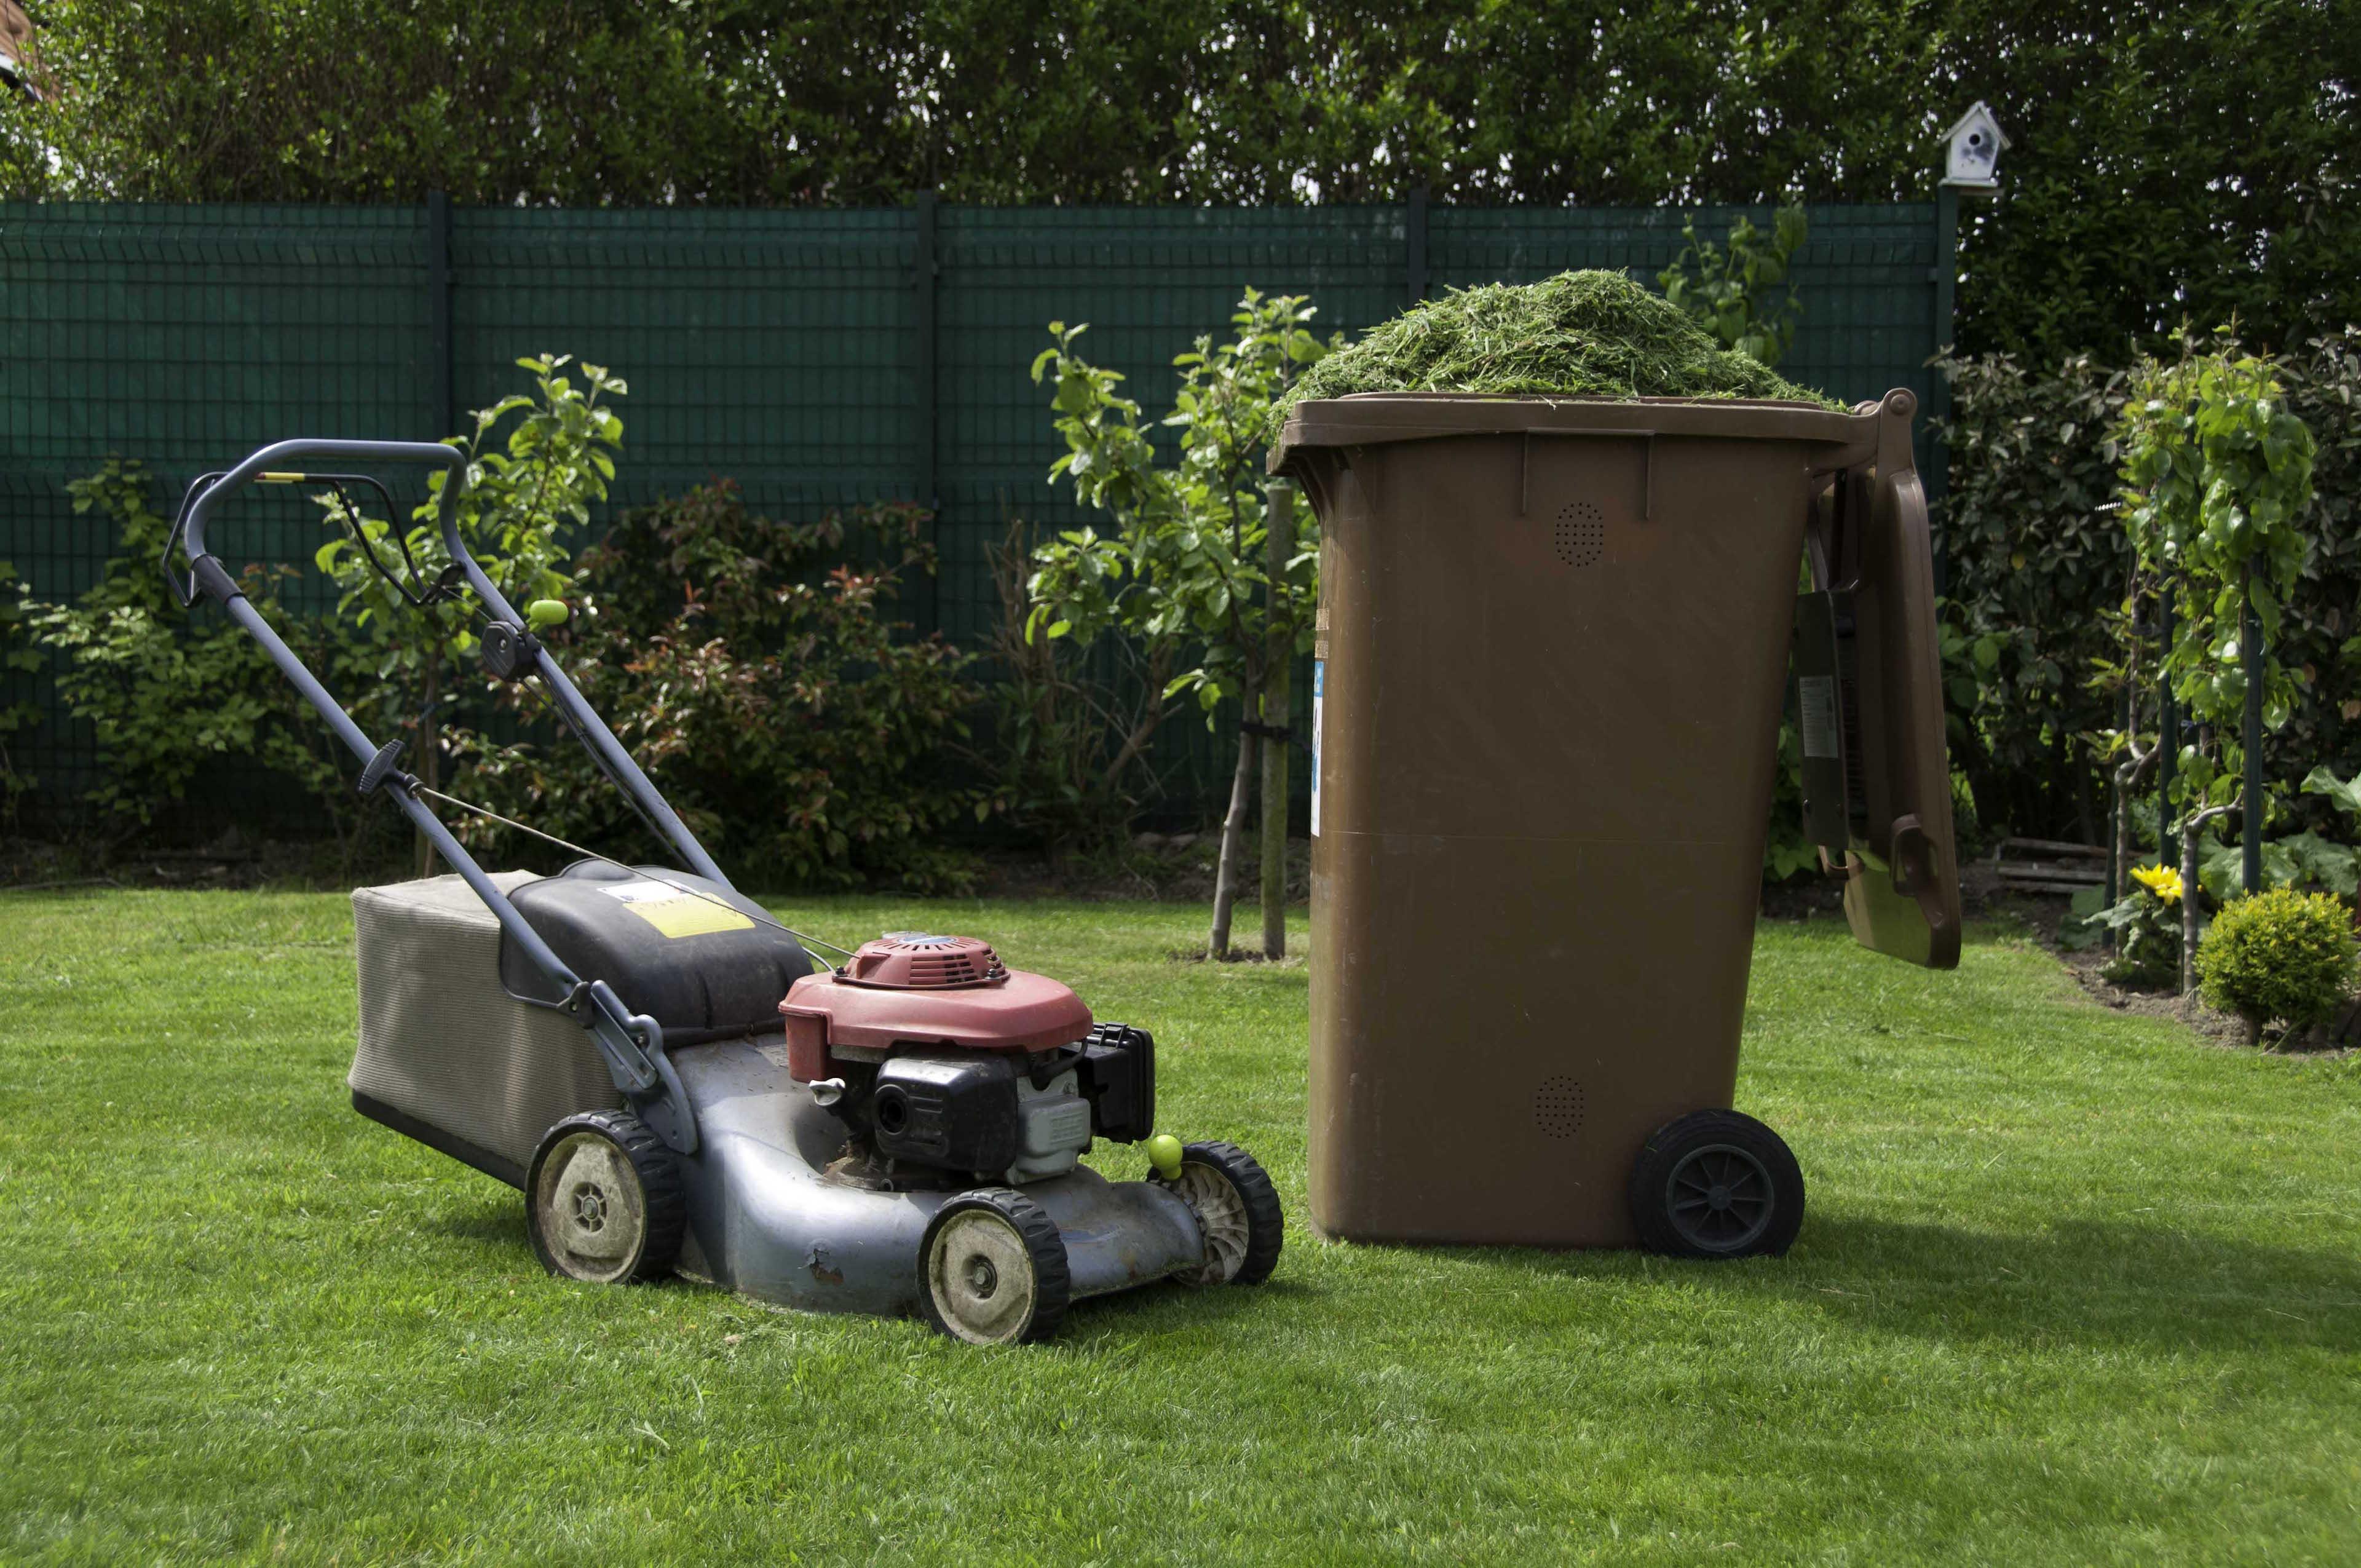 lawnmower-3840x2550.jpg